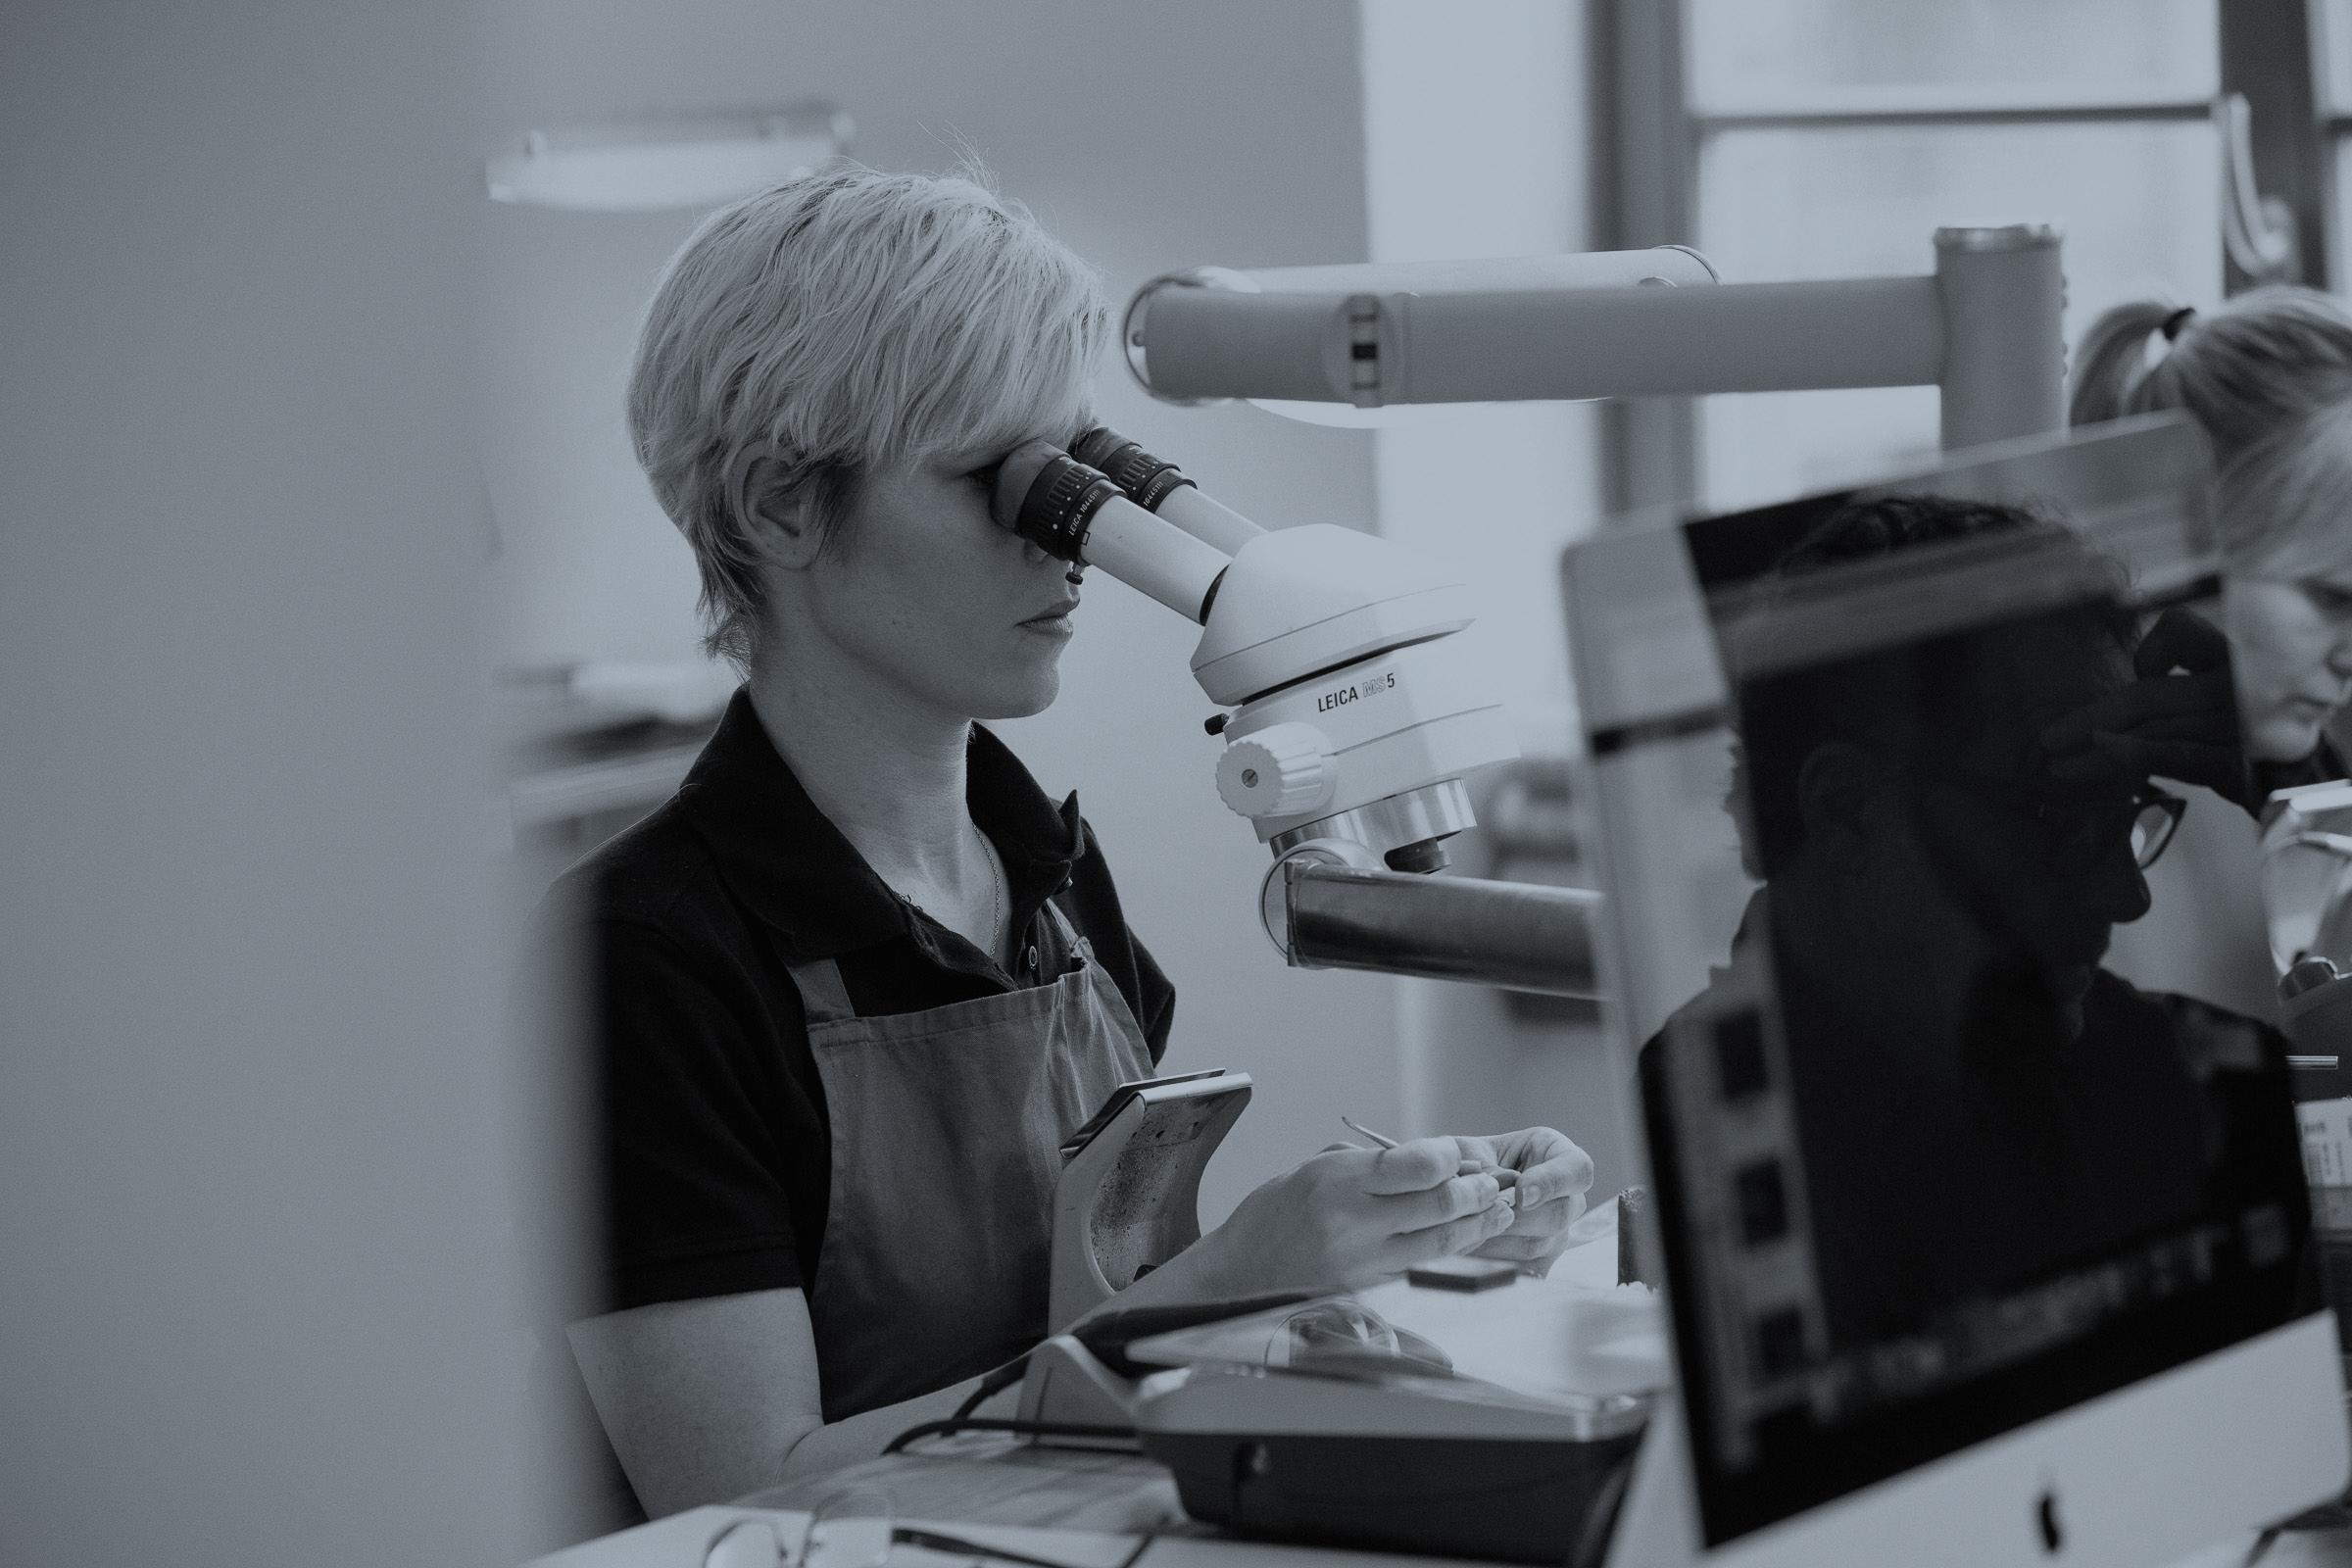 Ralf Barsties, Barsties und Barsties, Dentallabor, Zahntechnik, Implantologie, funktionelle und ästhetische Zahntechnik, Berlin, craniomandibuläre Dysfunktion